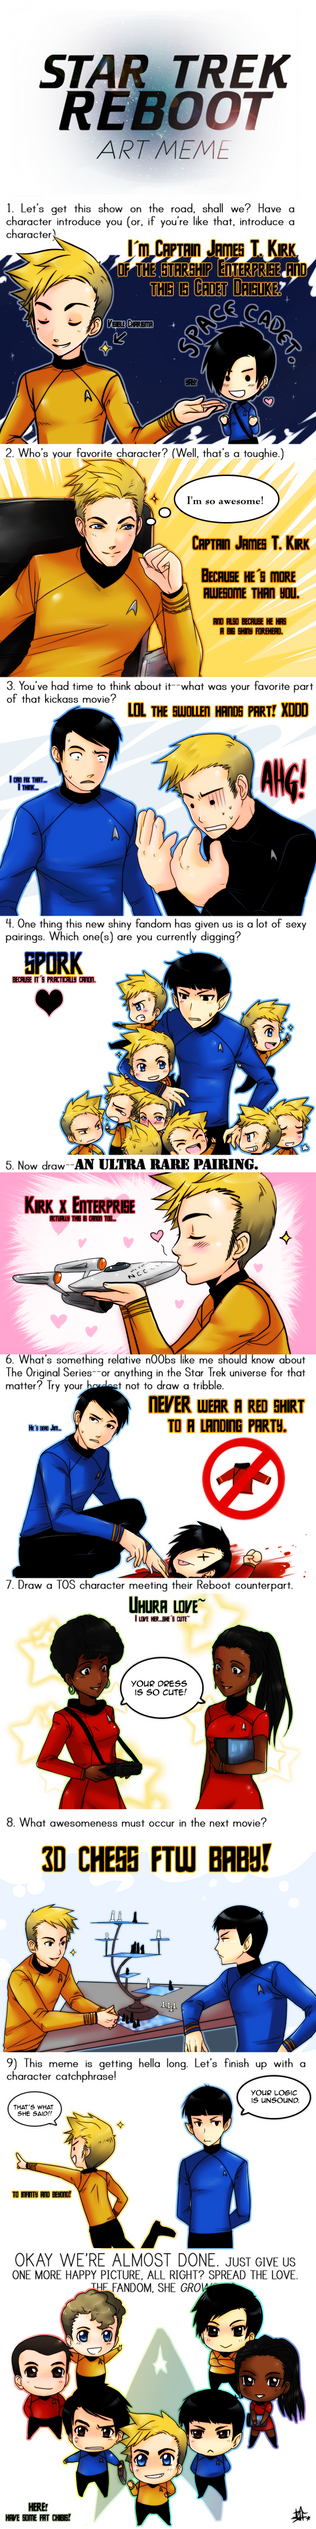 Star Trek Reboot Meme by ZombieDaisuke